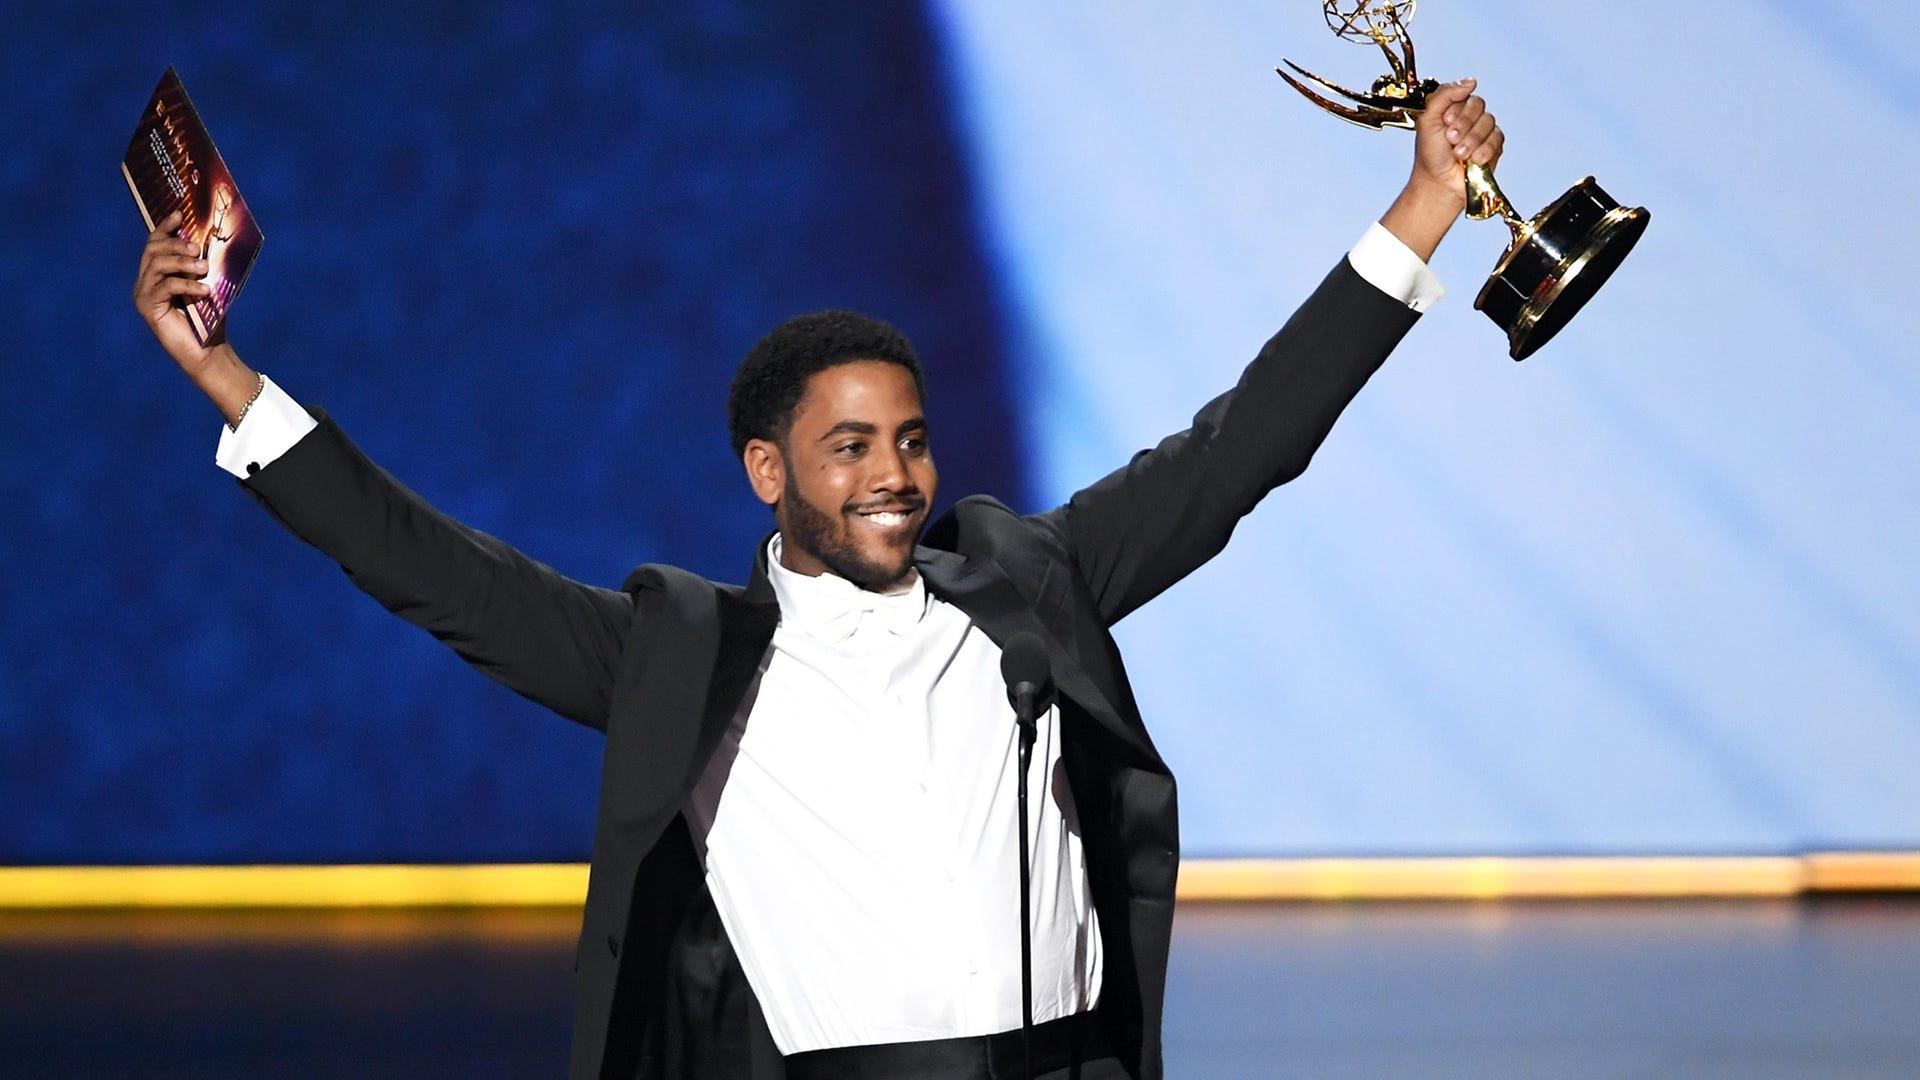 Jharrel Jerome at the 2019 Primetime Emmy Awards